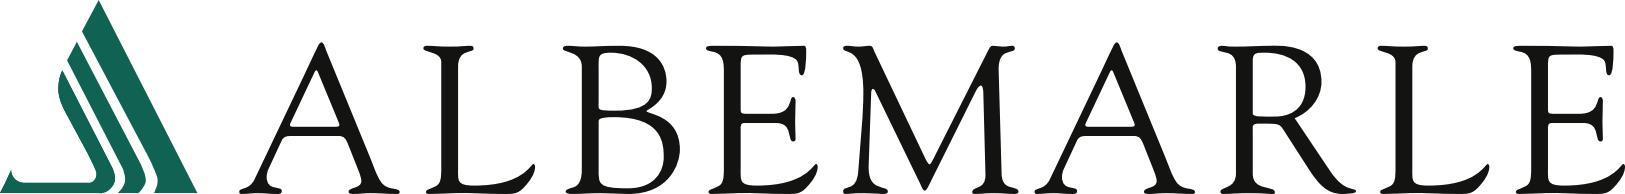 albermarle corporation logo